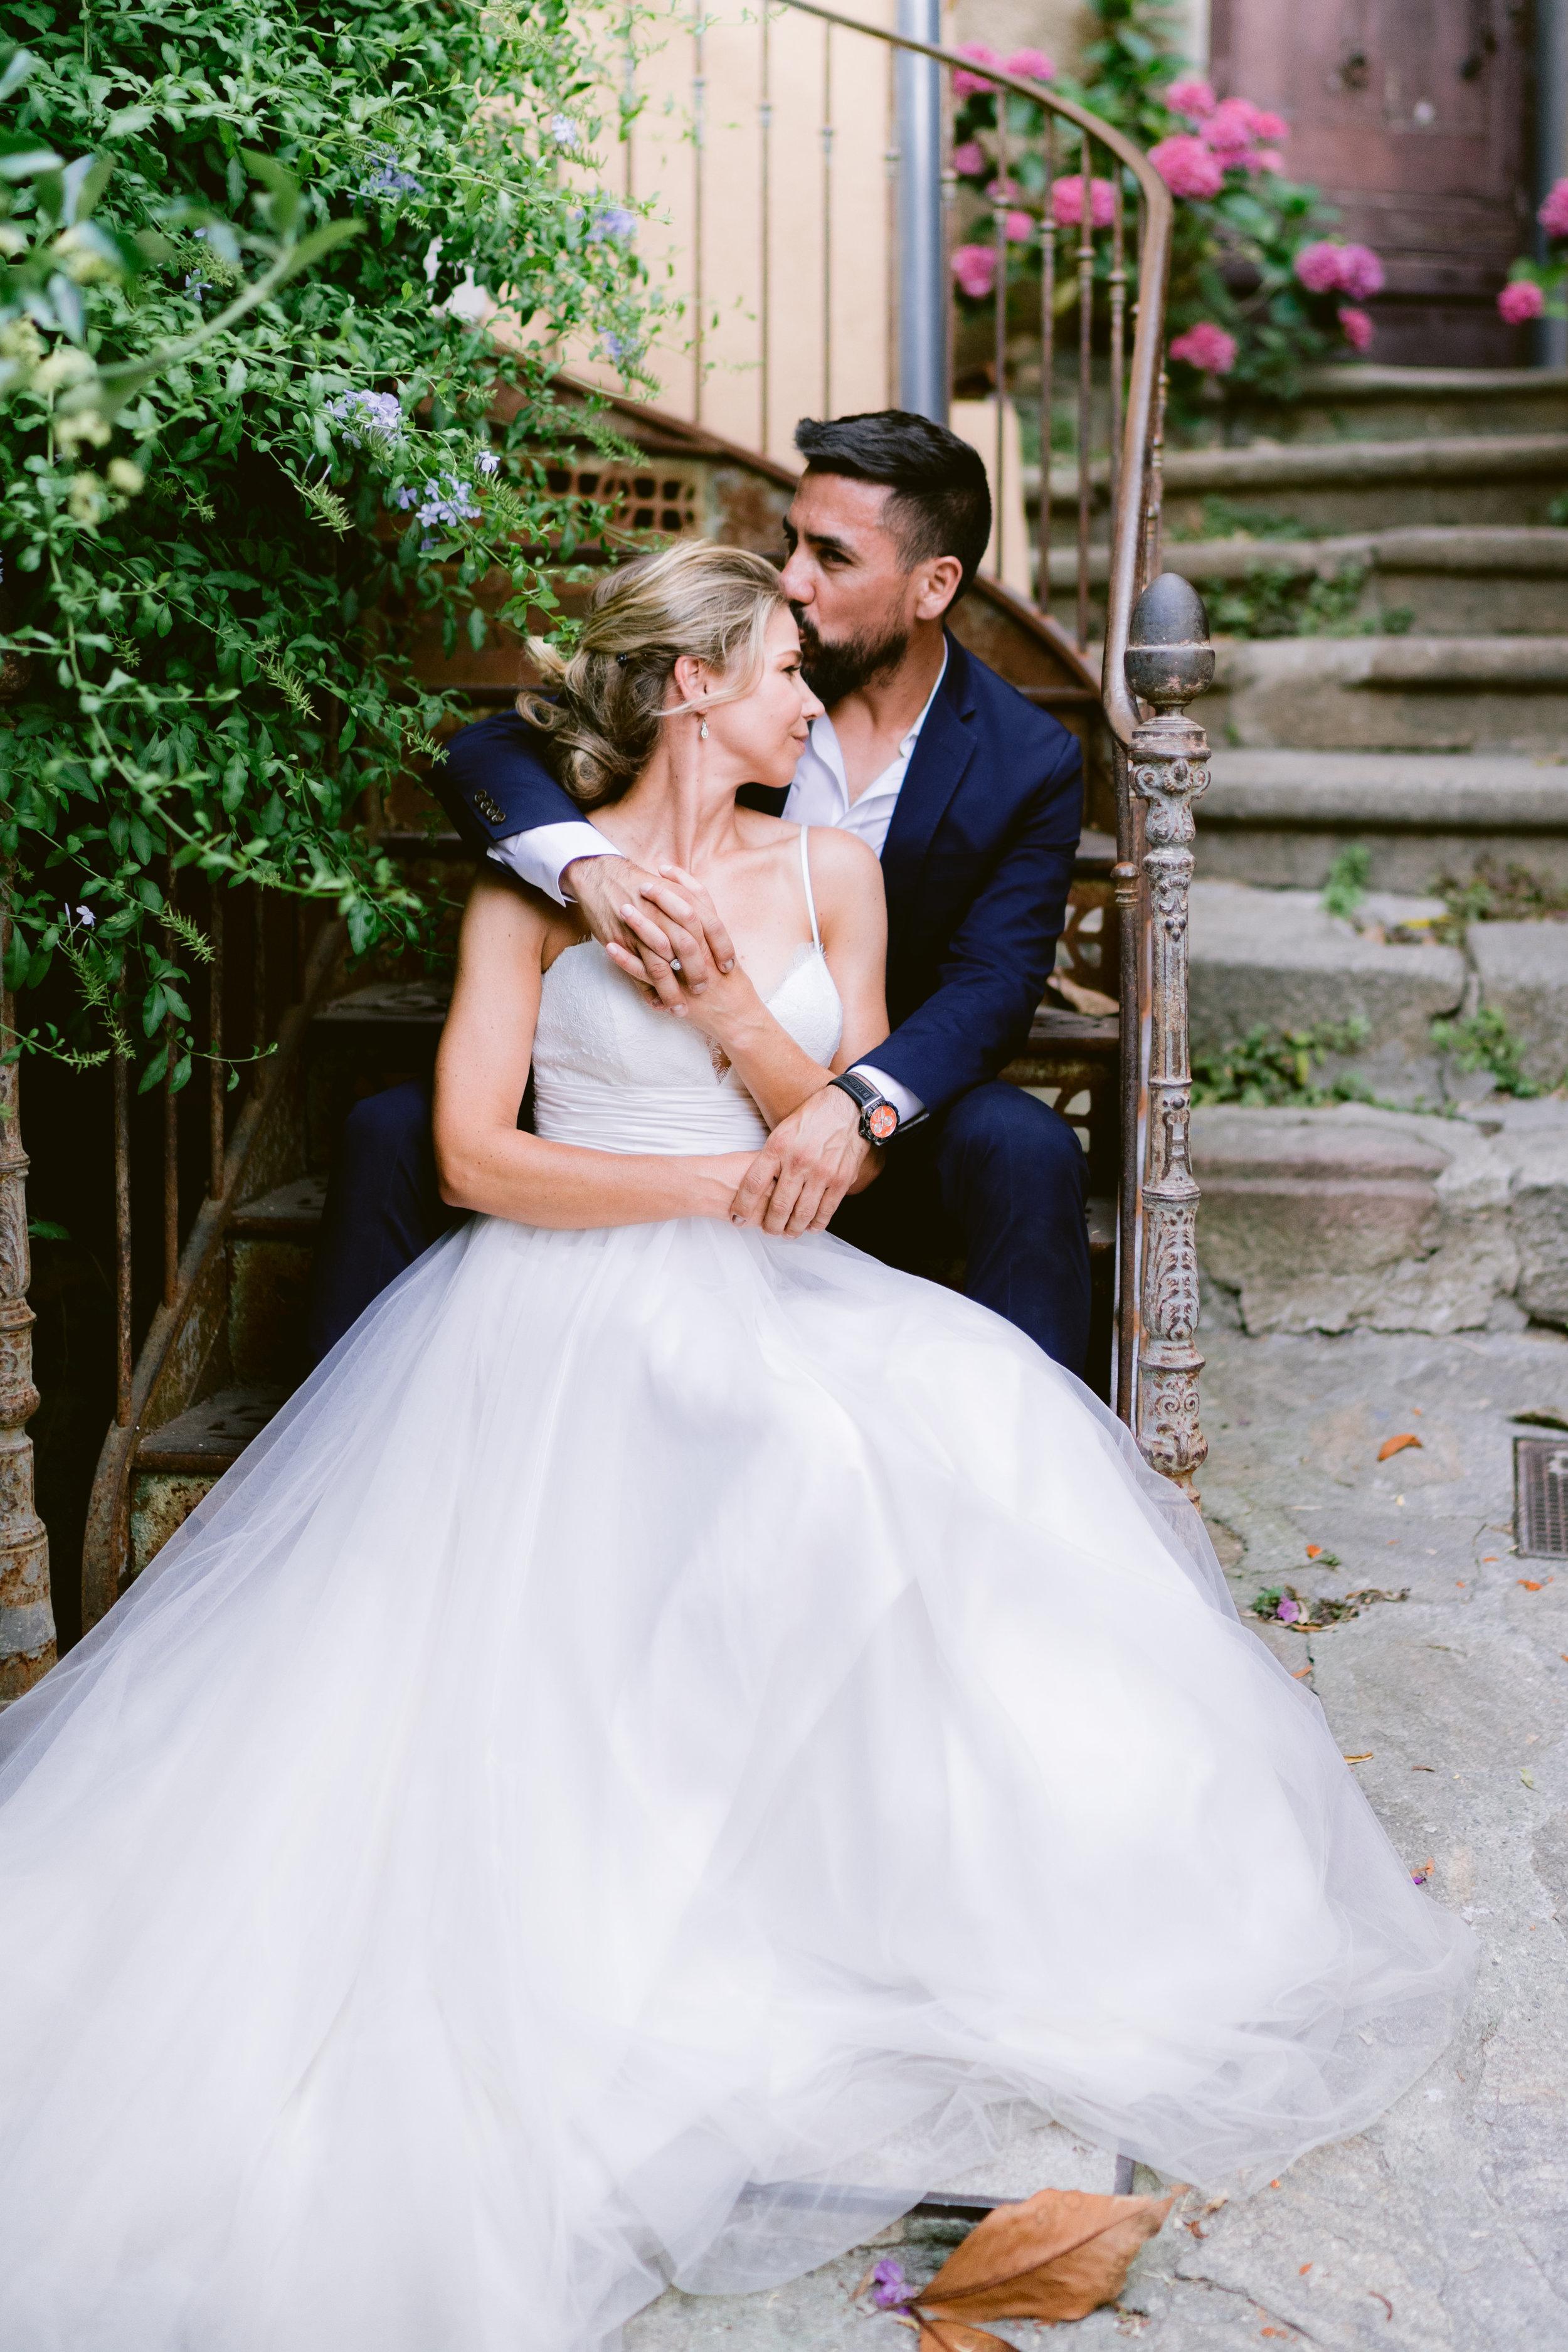 english photographer in france, wedding photographer saint tropez, romantic wedding photography france, chateau wedding france, cote d'azur wedding photographer, ramatuelle wedding (15).jpg